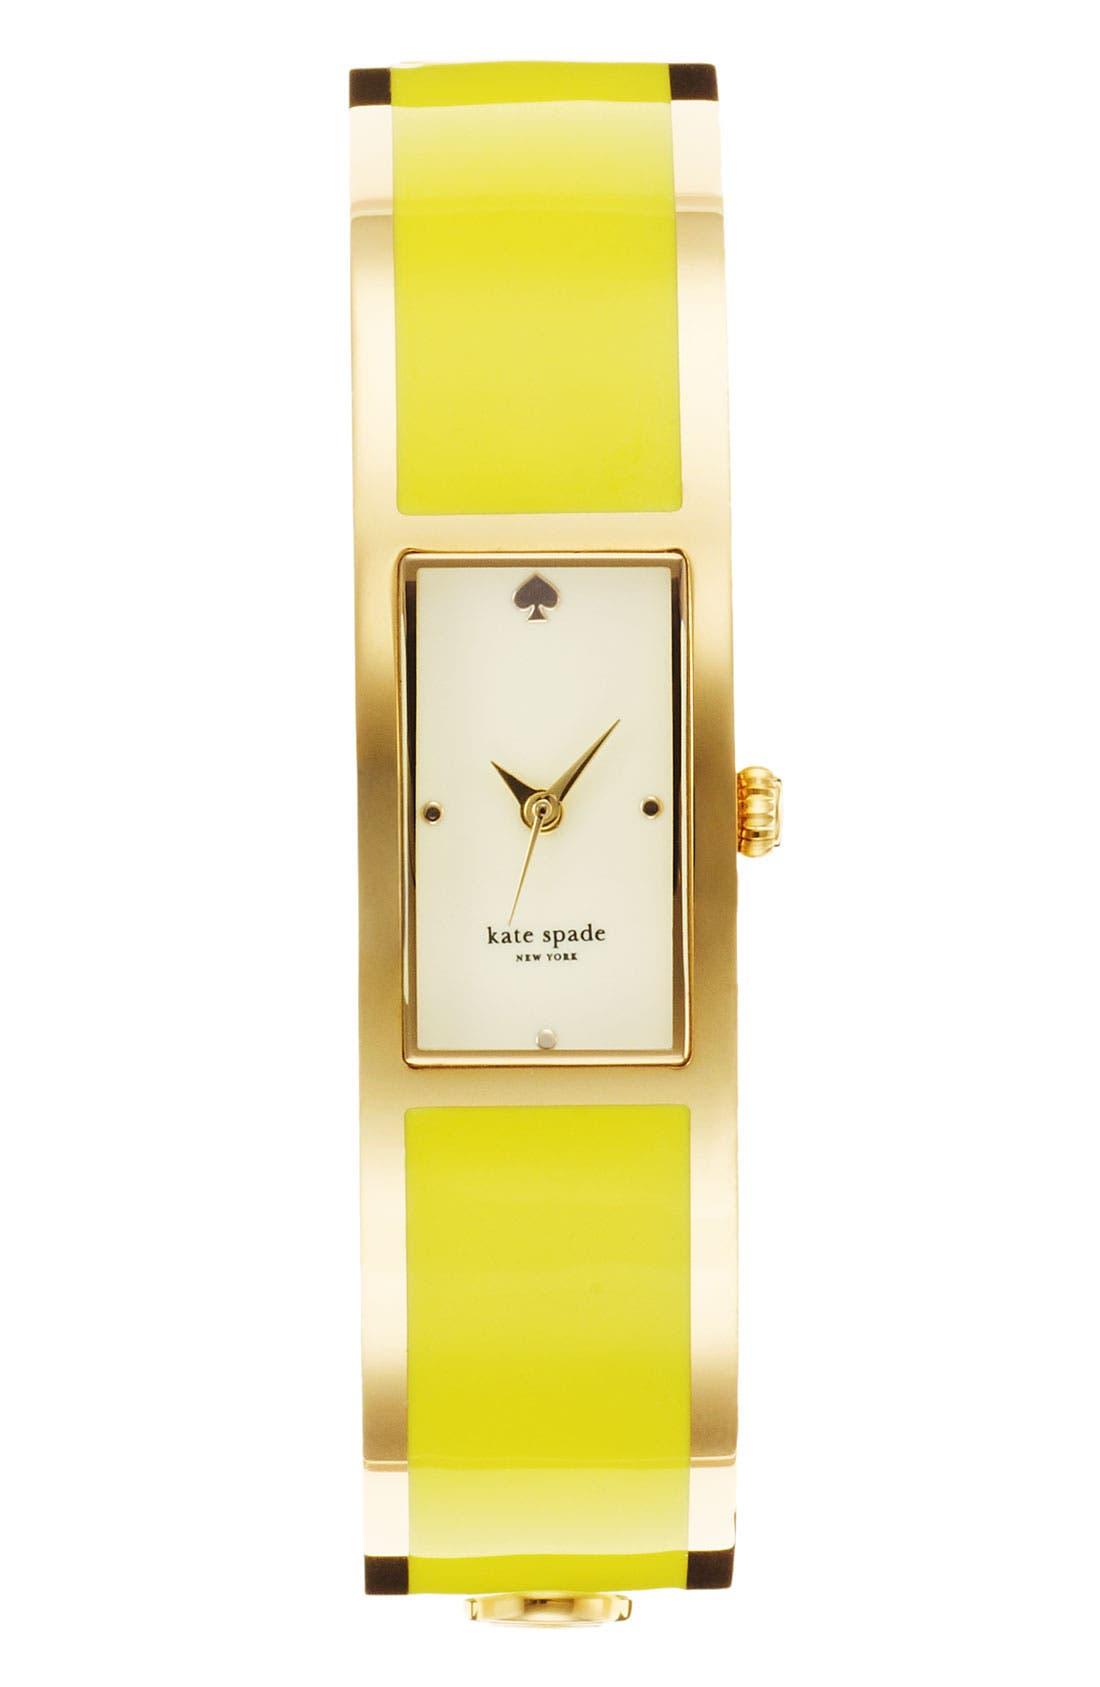 Main Image - kate spade new york 'carousel' bangle watch, 15mm x 16mm